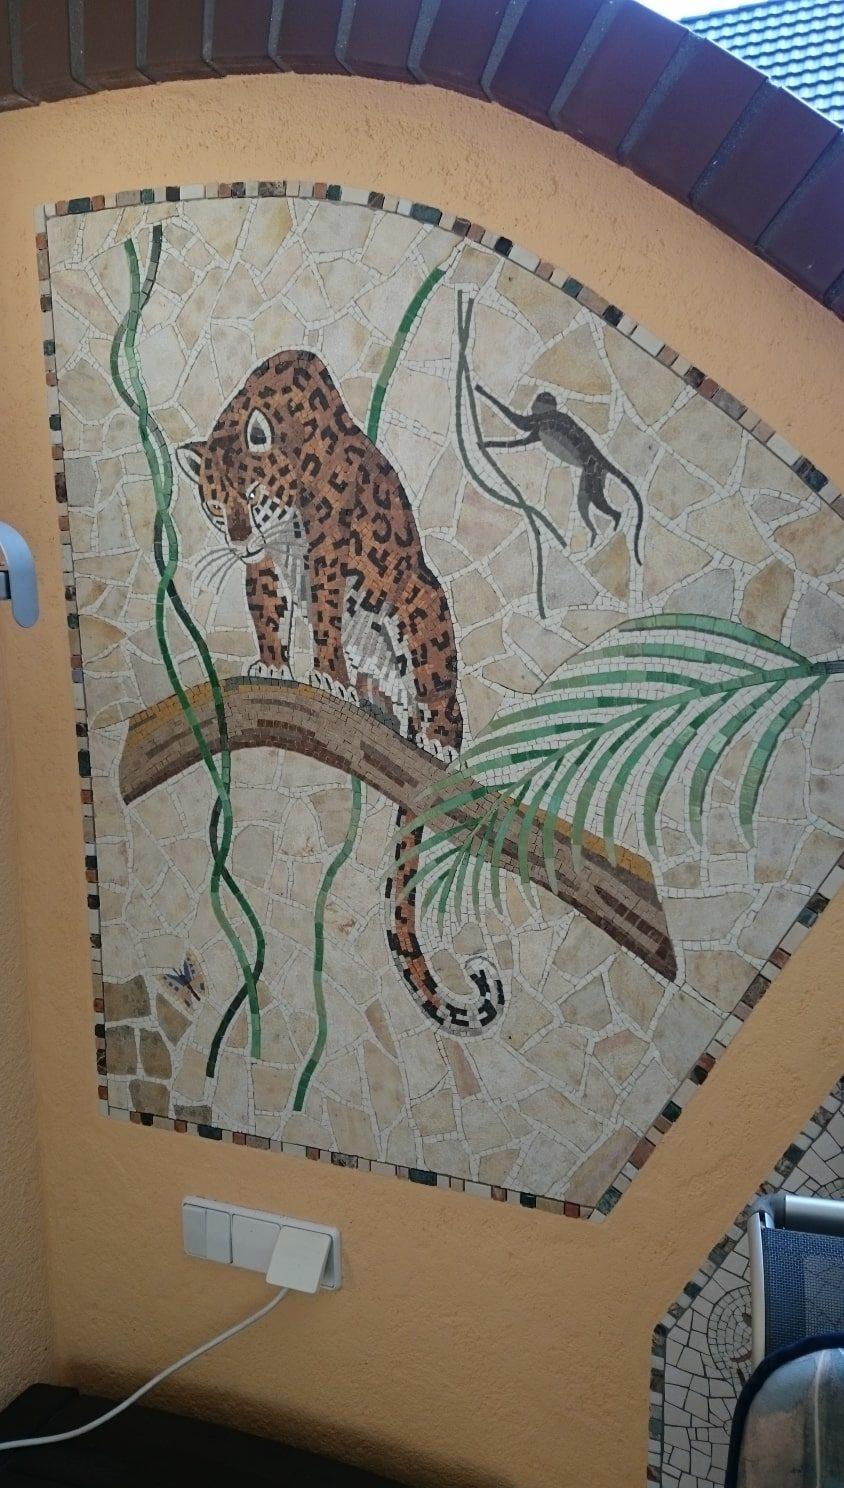 Ihr FLIESEN- PLATTEN & MOSAIKLEGERMEISTER Torsten Jupe. Mosaik Wandbild Leo39